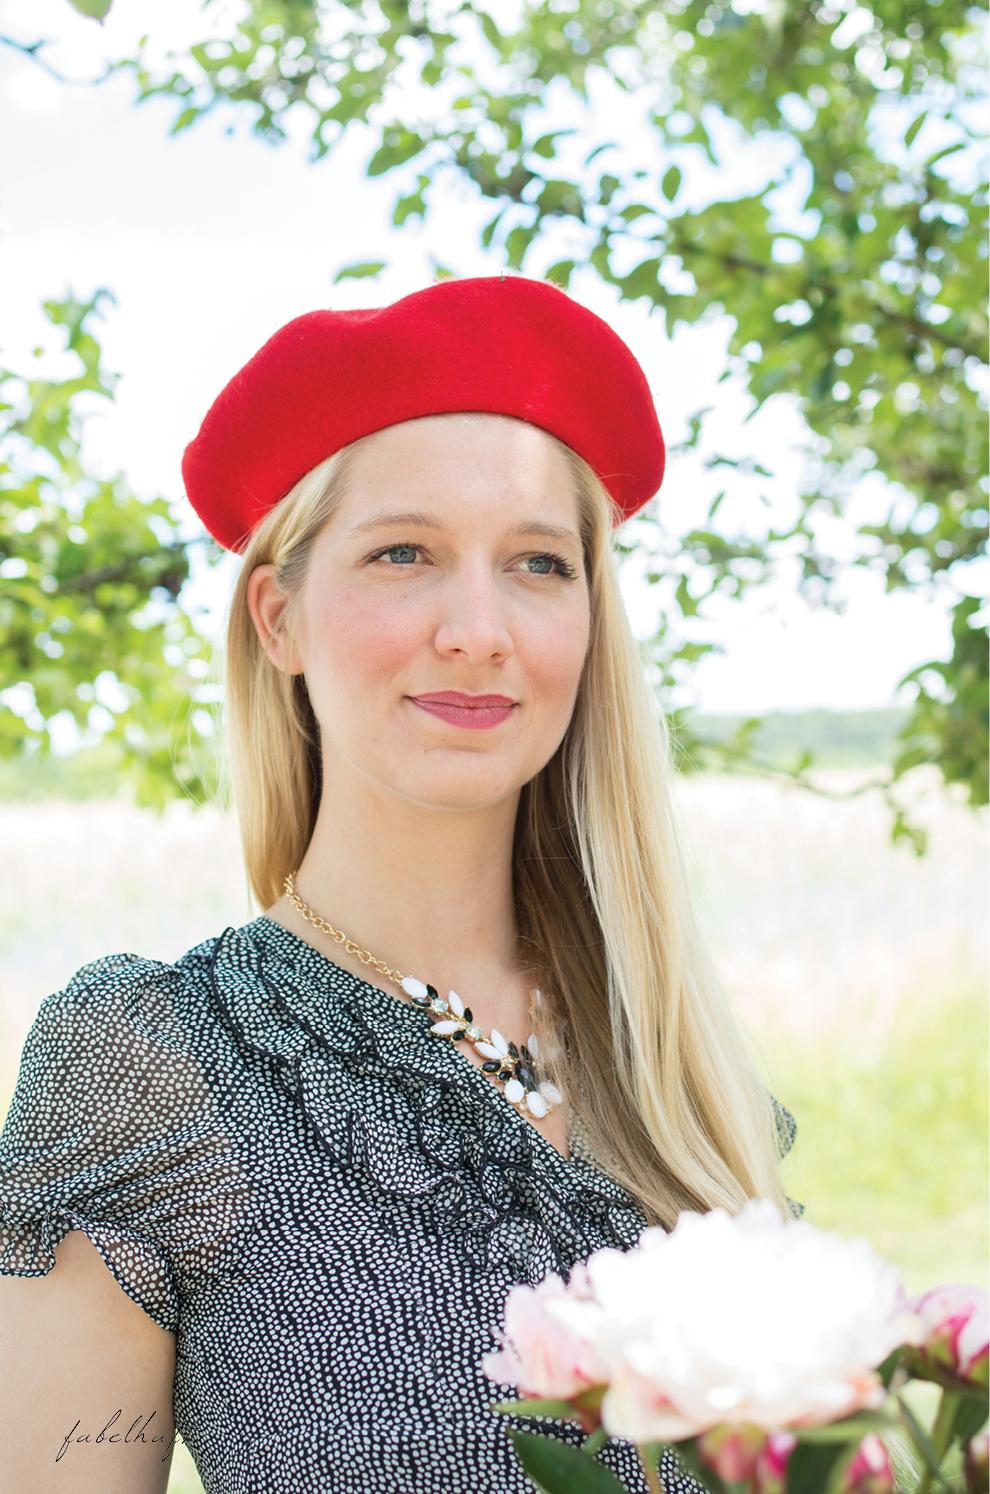 Miss Etoile Chiffon Kleid Parisien Baskenmütze Rot